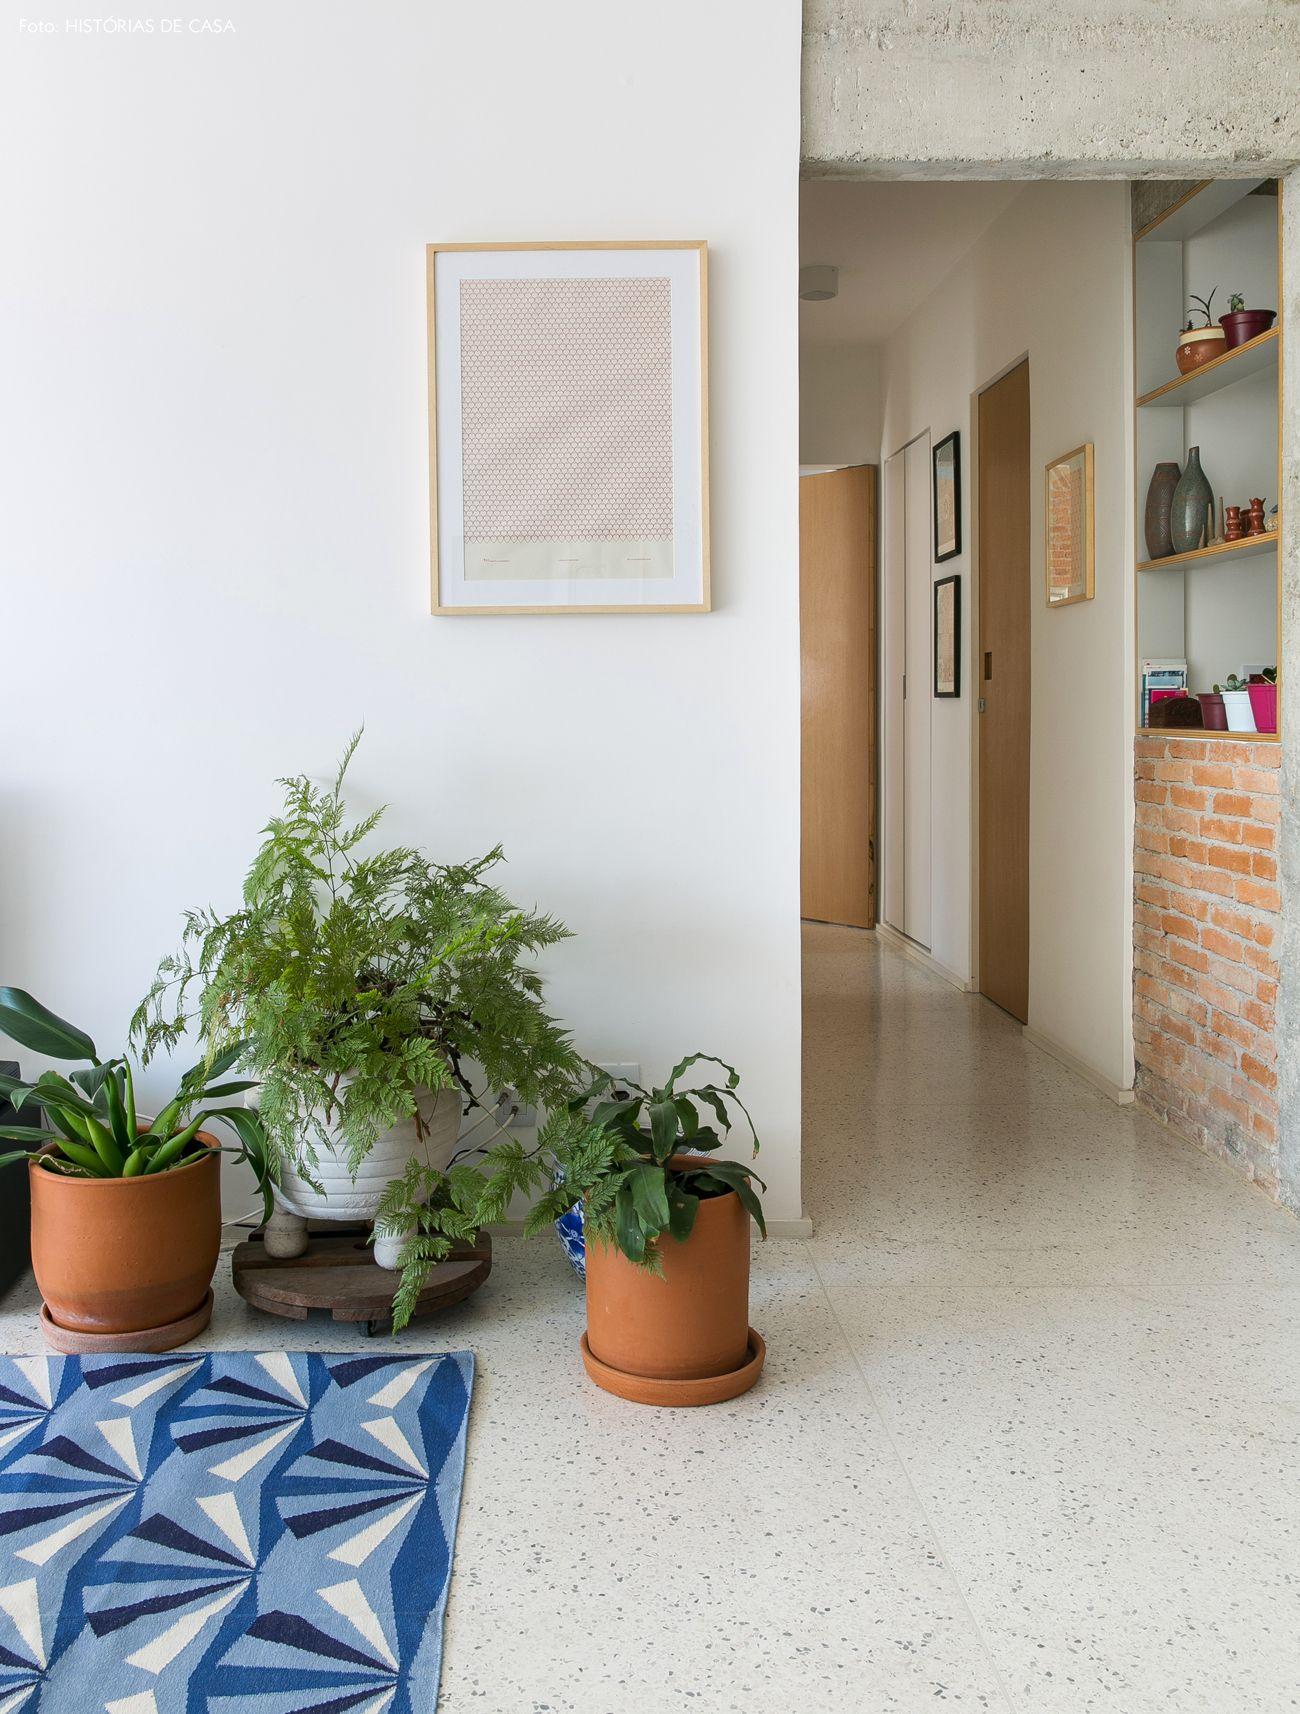 Valor Artesanal Piso De Granilite Granilite E Parede De Tijolos -> Piso Parede Sala